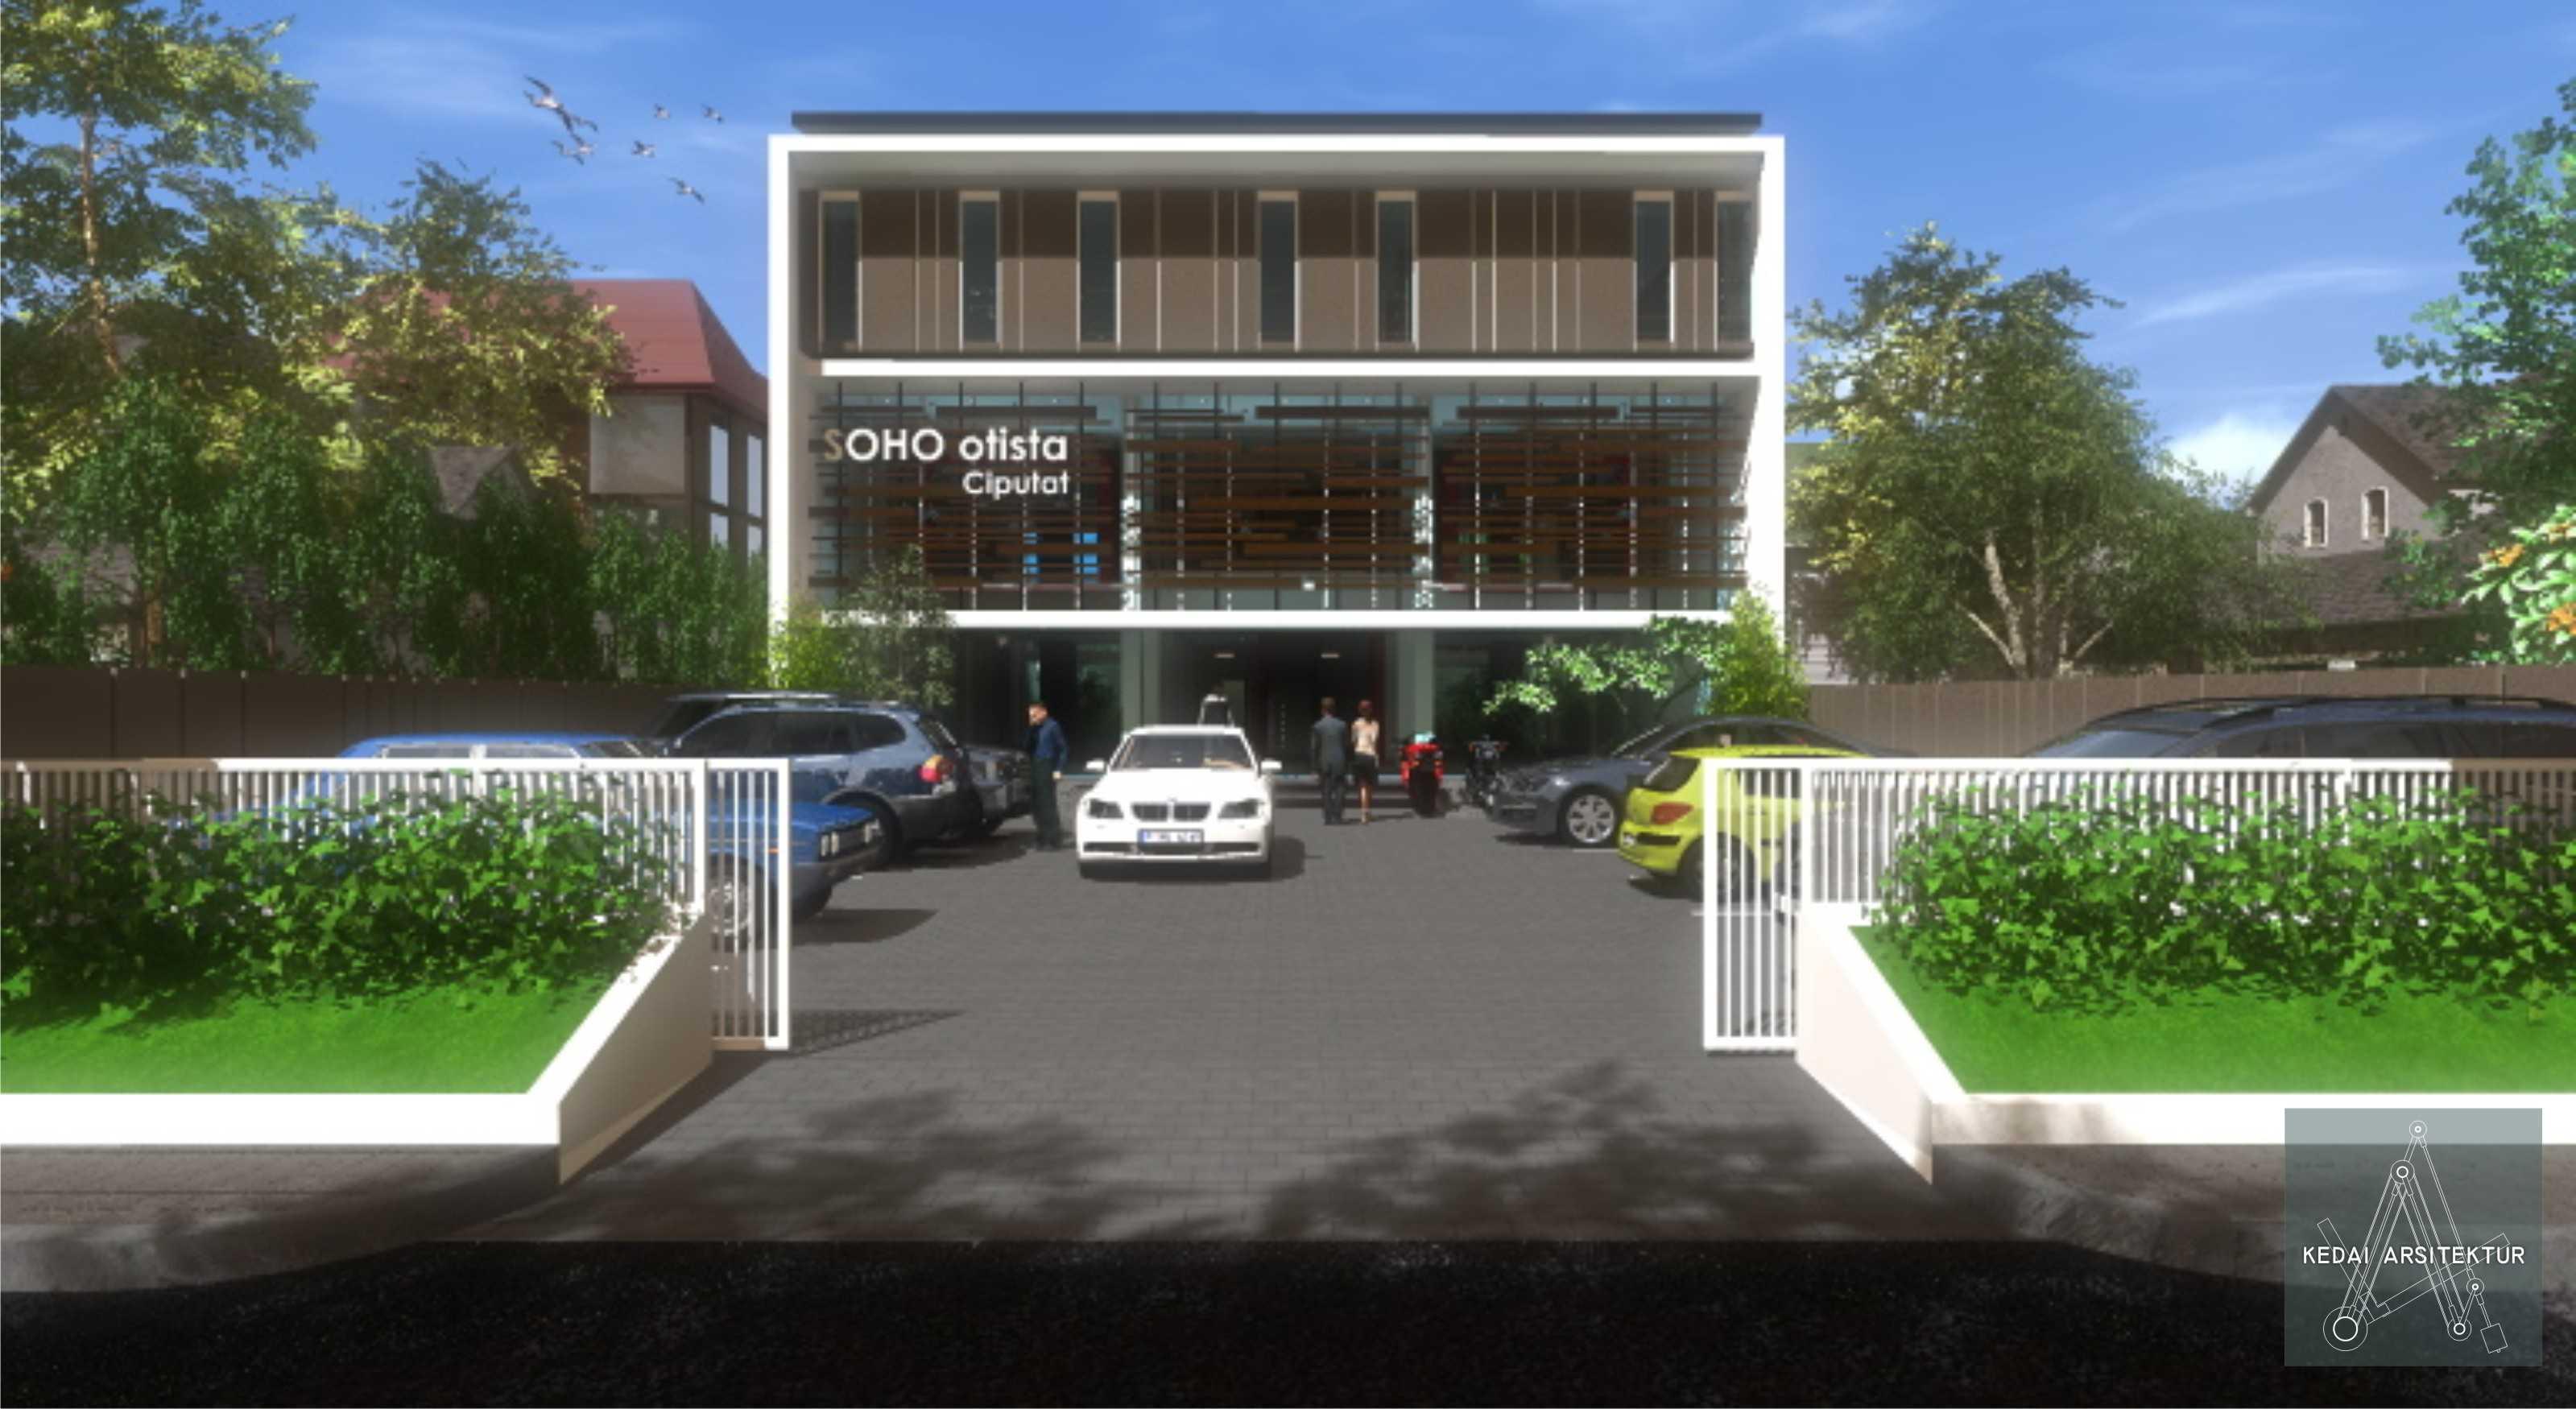 Kedai.arsitektur Soho Ciputat Ciputat, Kota Tangerang Selatan, Banten, Indonesia Ciputat, Kota Tangerang Selatan, Banten, Indonesia Soho-Ciputat-8 Kontemporer  36616